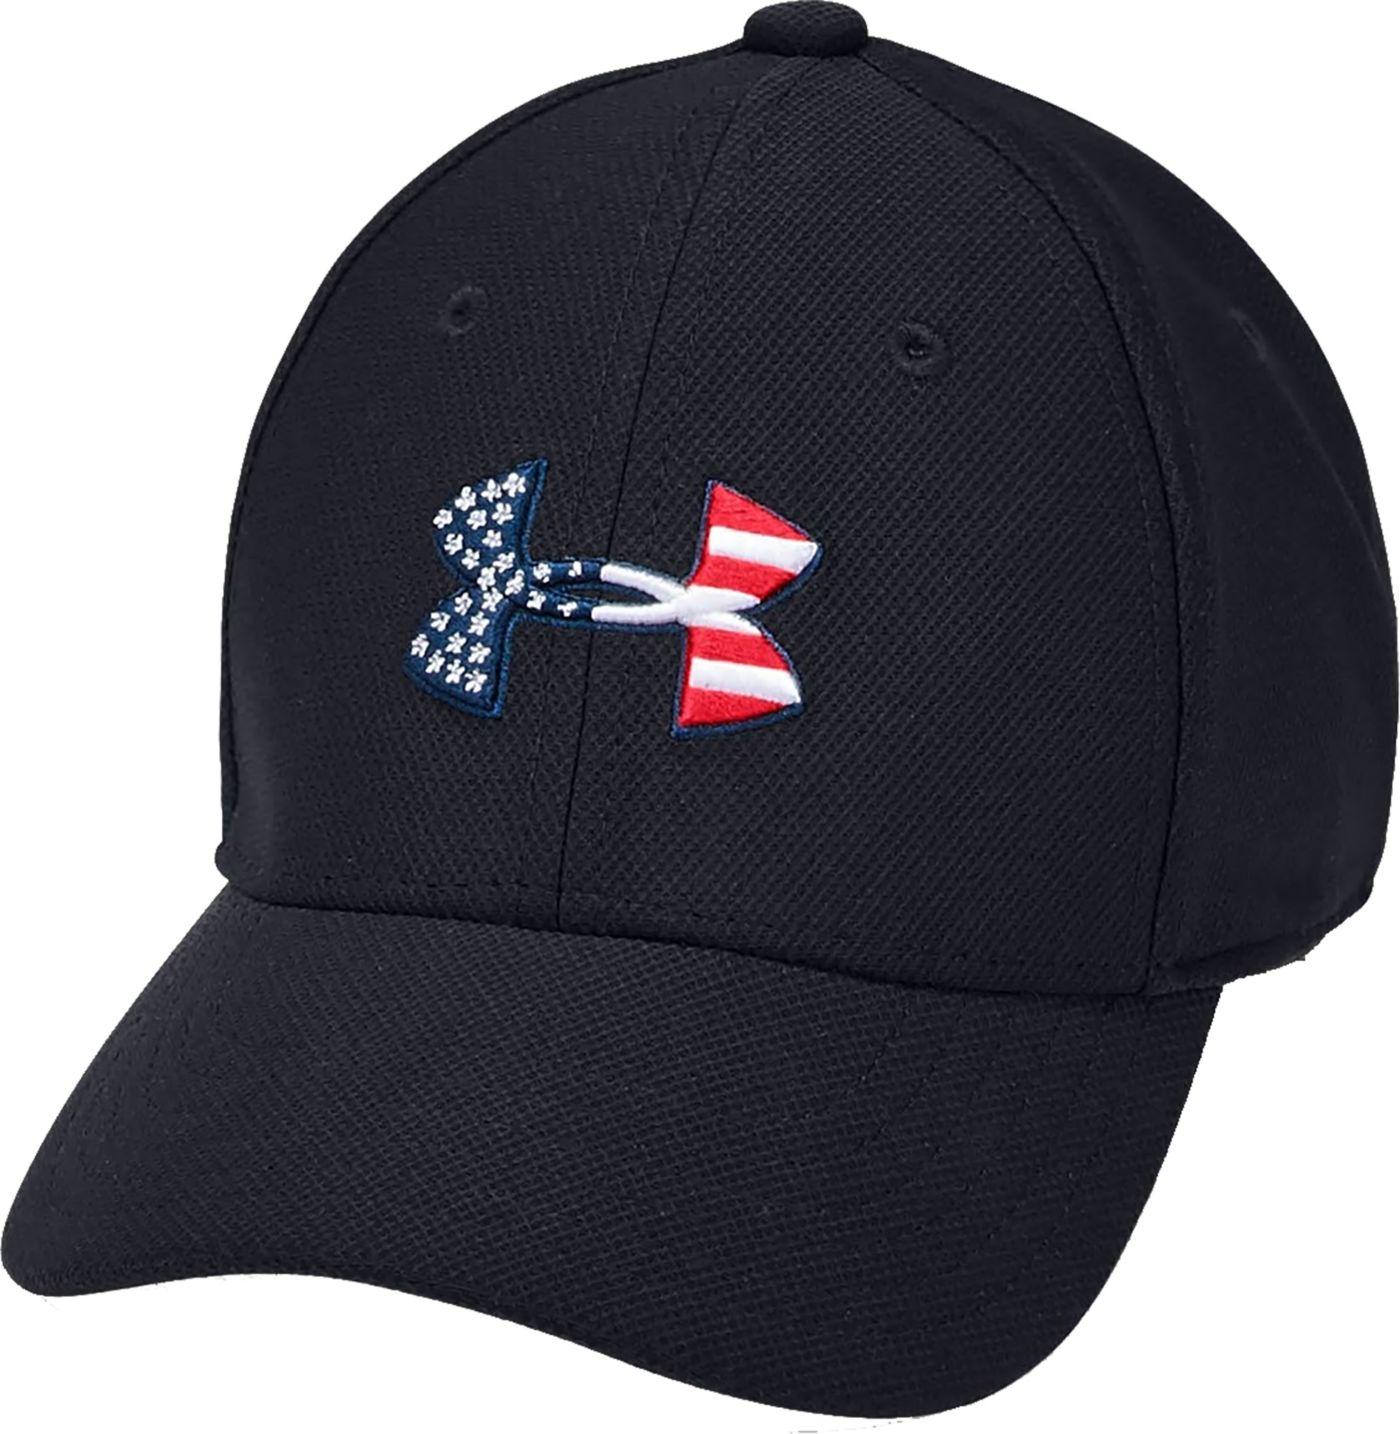 Under Armour Boy's Freedom Blitzing Cap